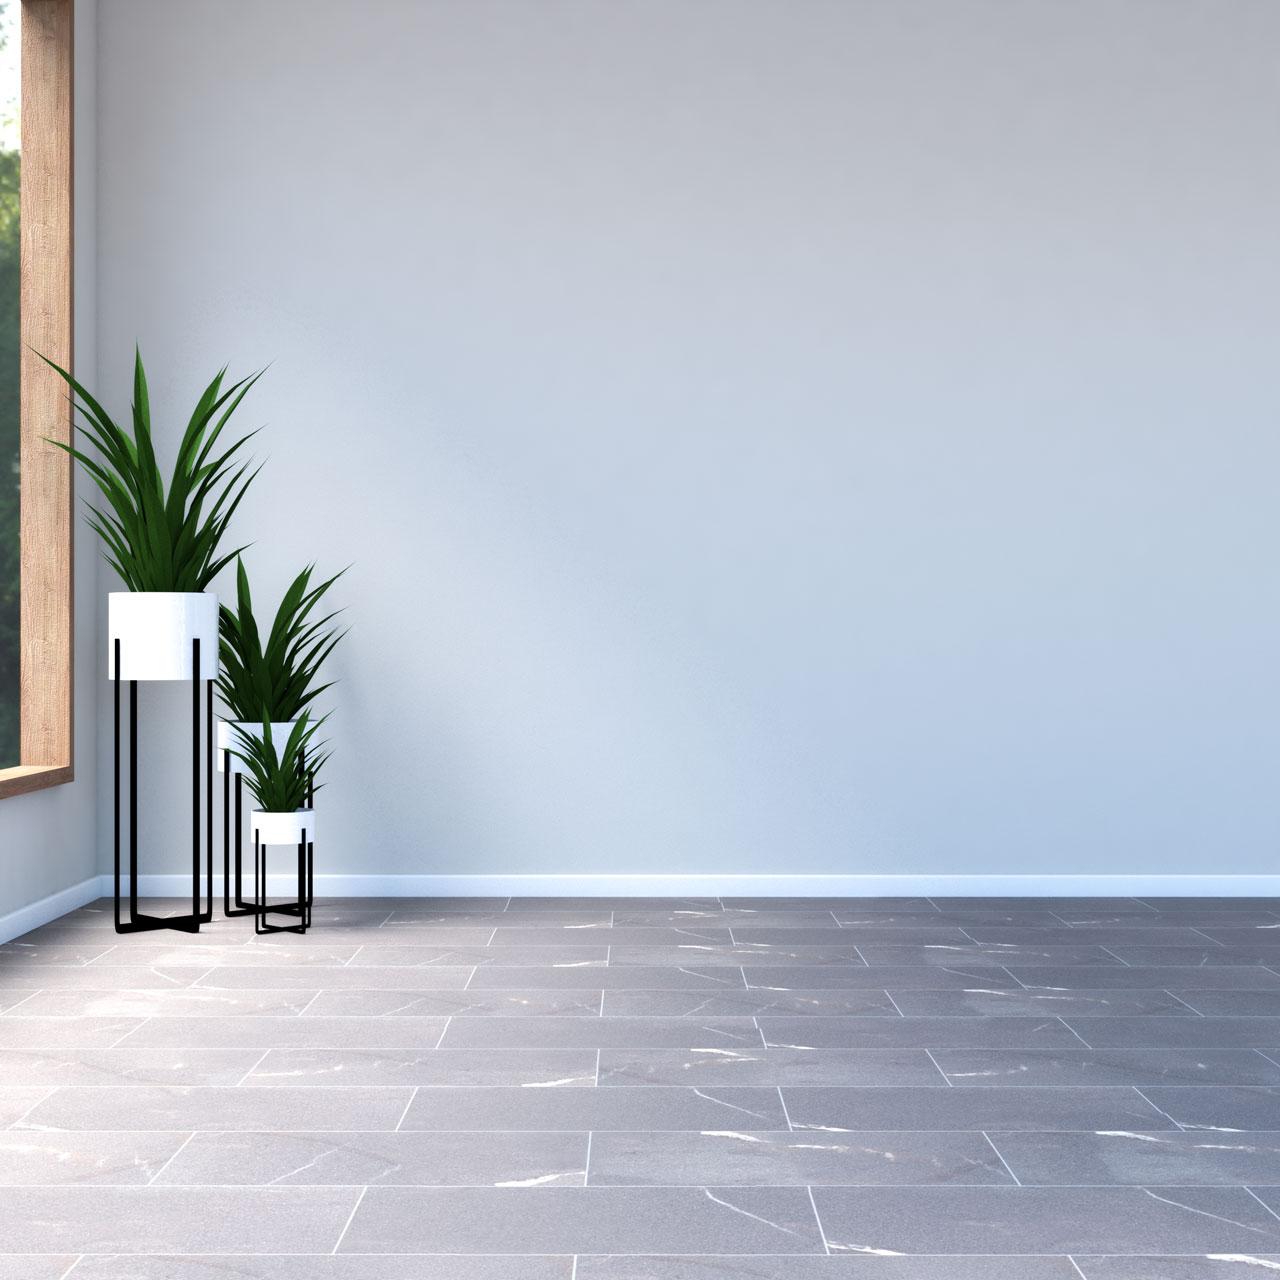 Beige walls with brown floors